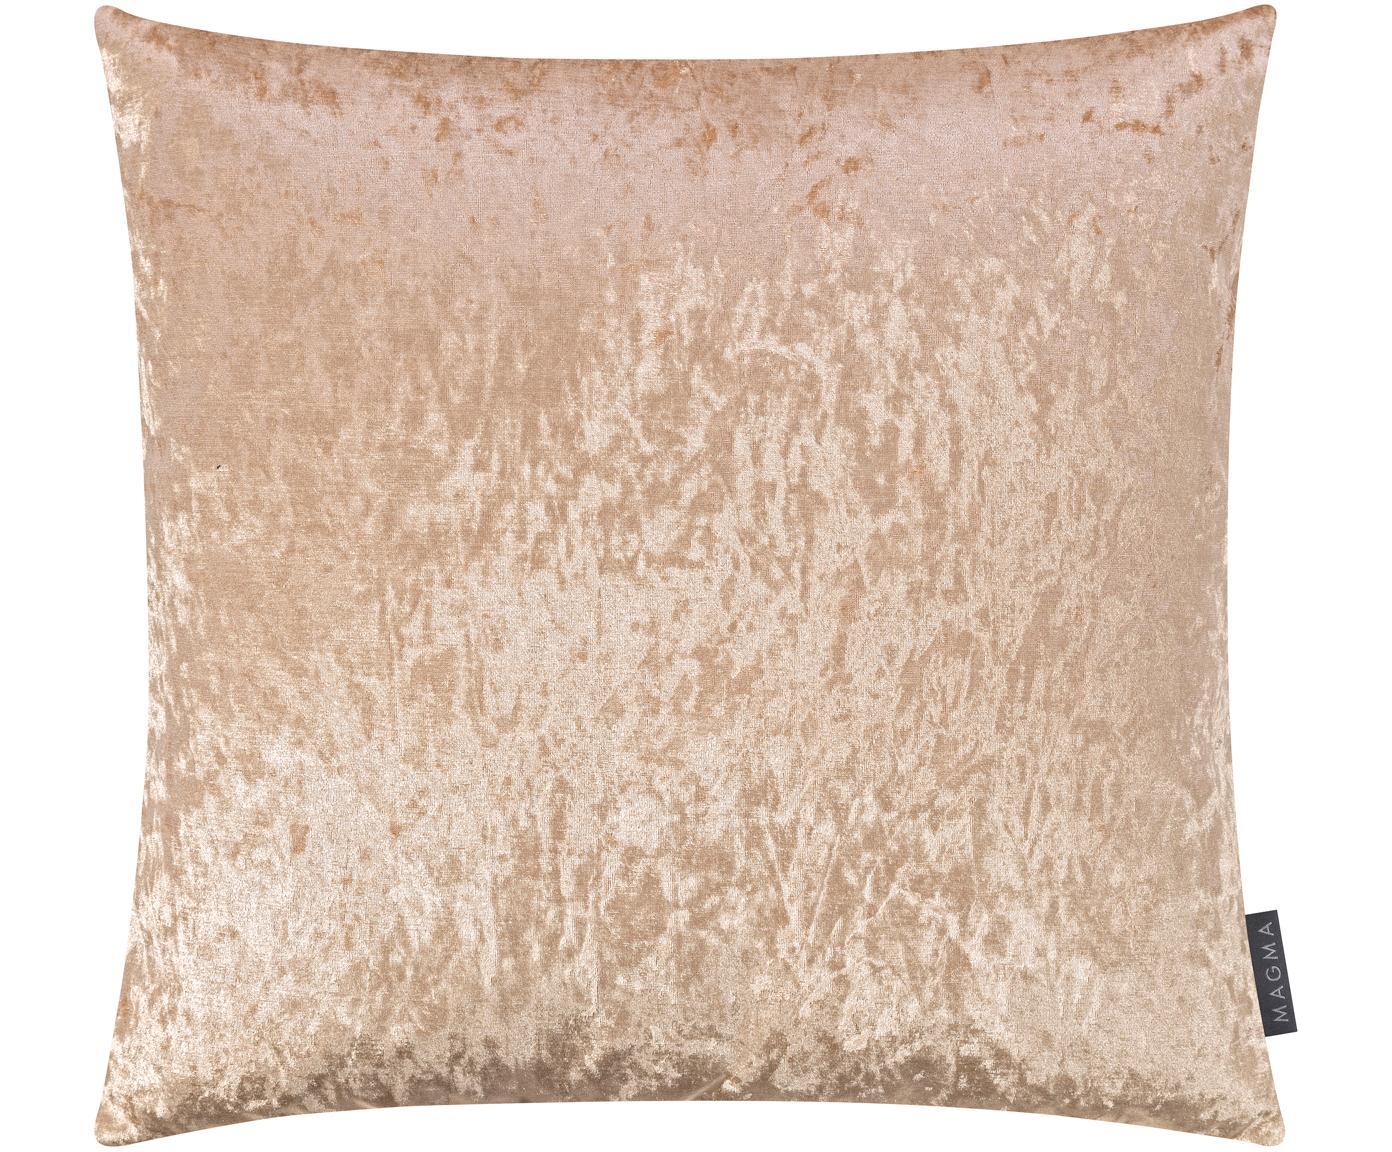 Samt-Kissenhülle Shanta mit schimmerndem Vintage-Muster, 100% Polyestersamt, Champagnerfarben, 40 x 40 cm